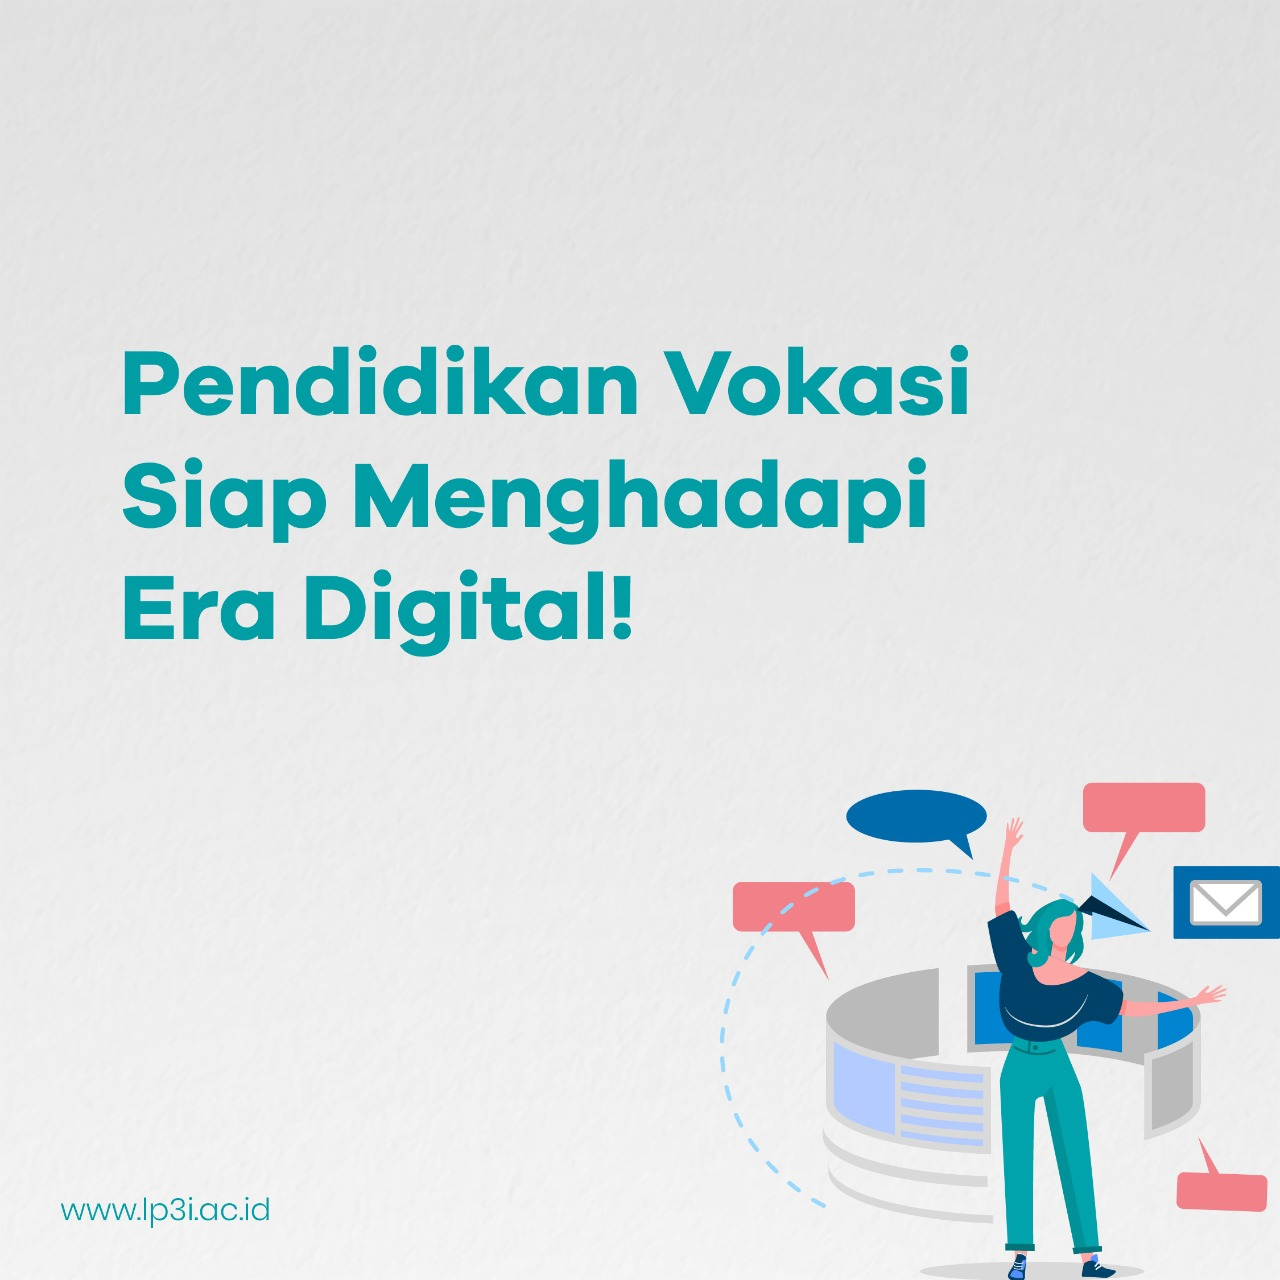 Pendidikan Vokasi Siap Menghadapi Era Digital